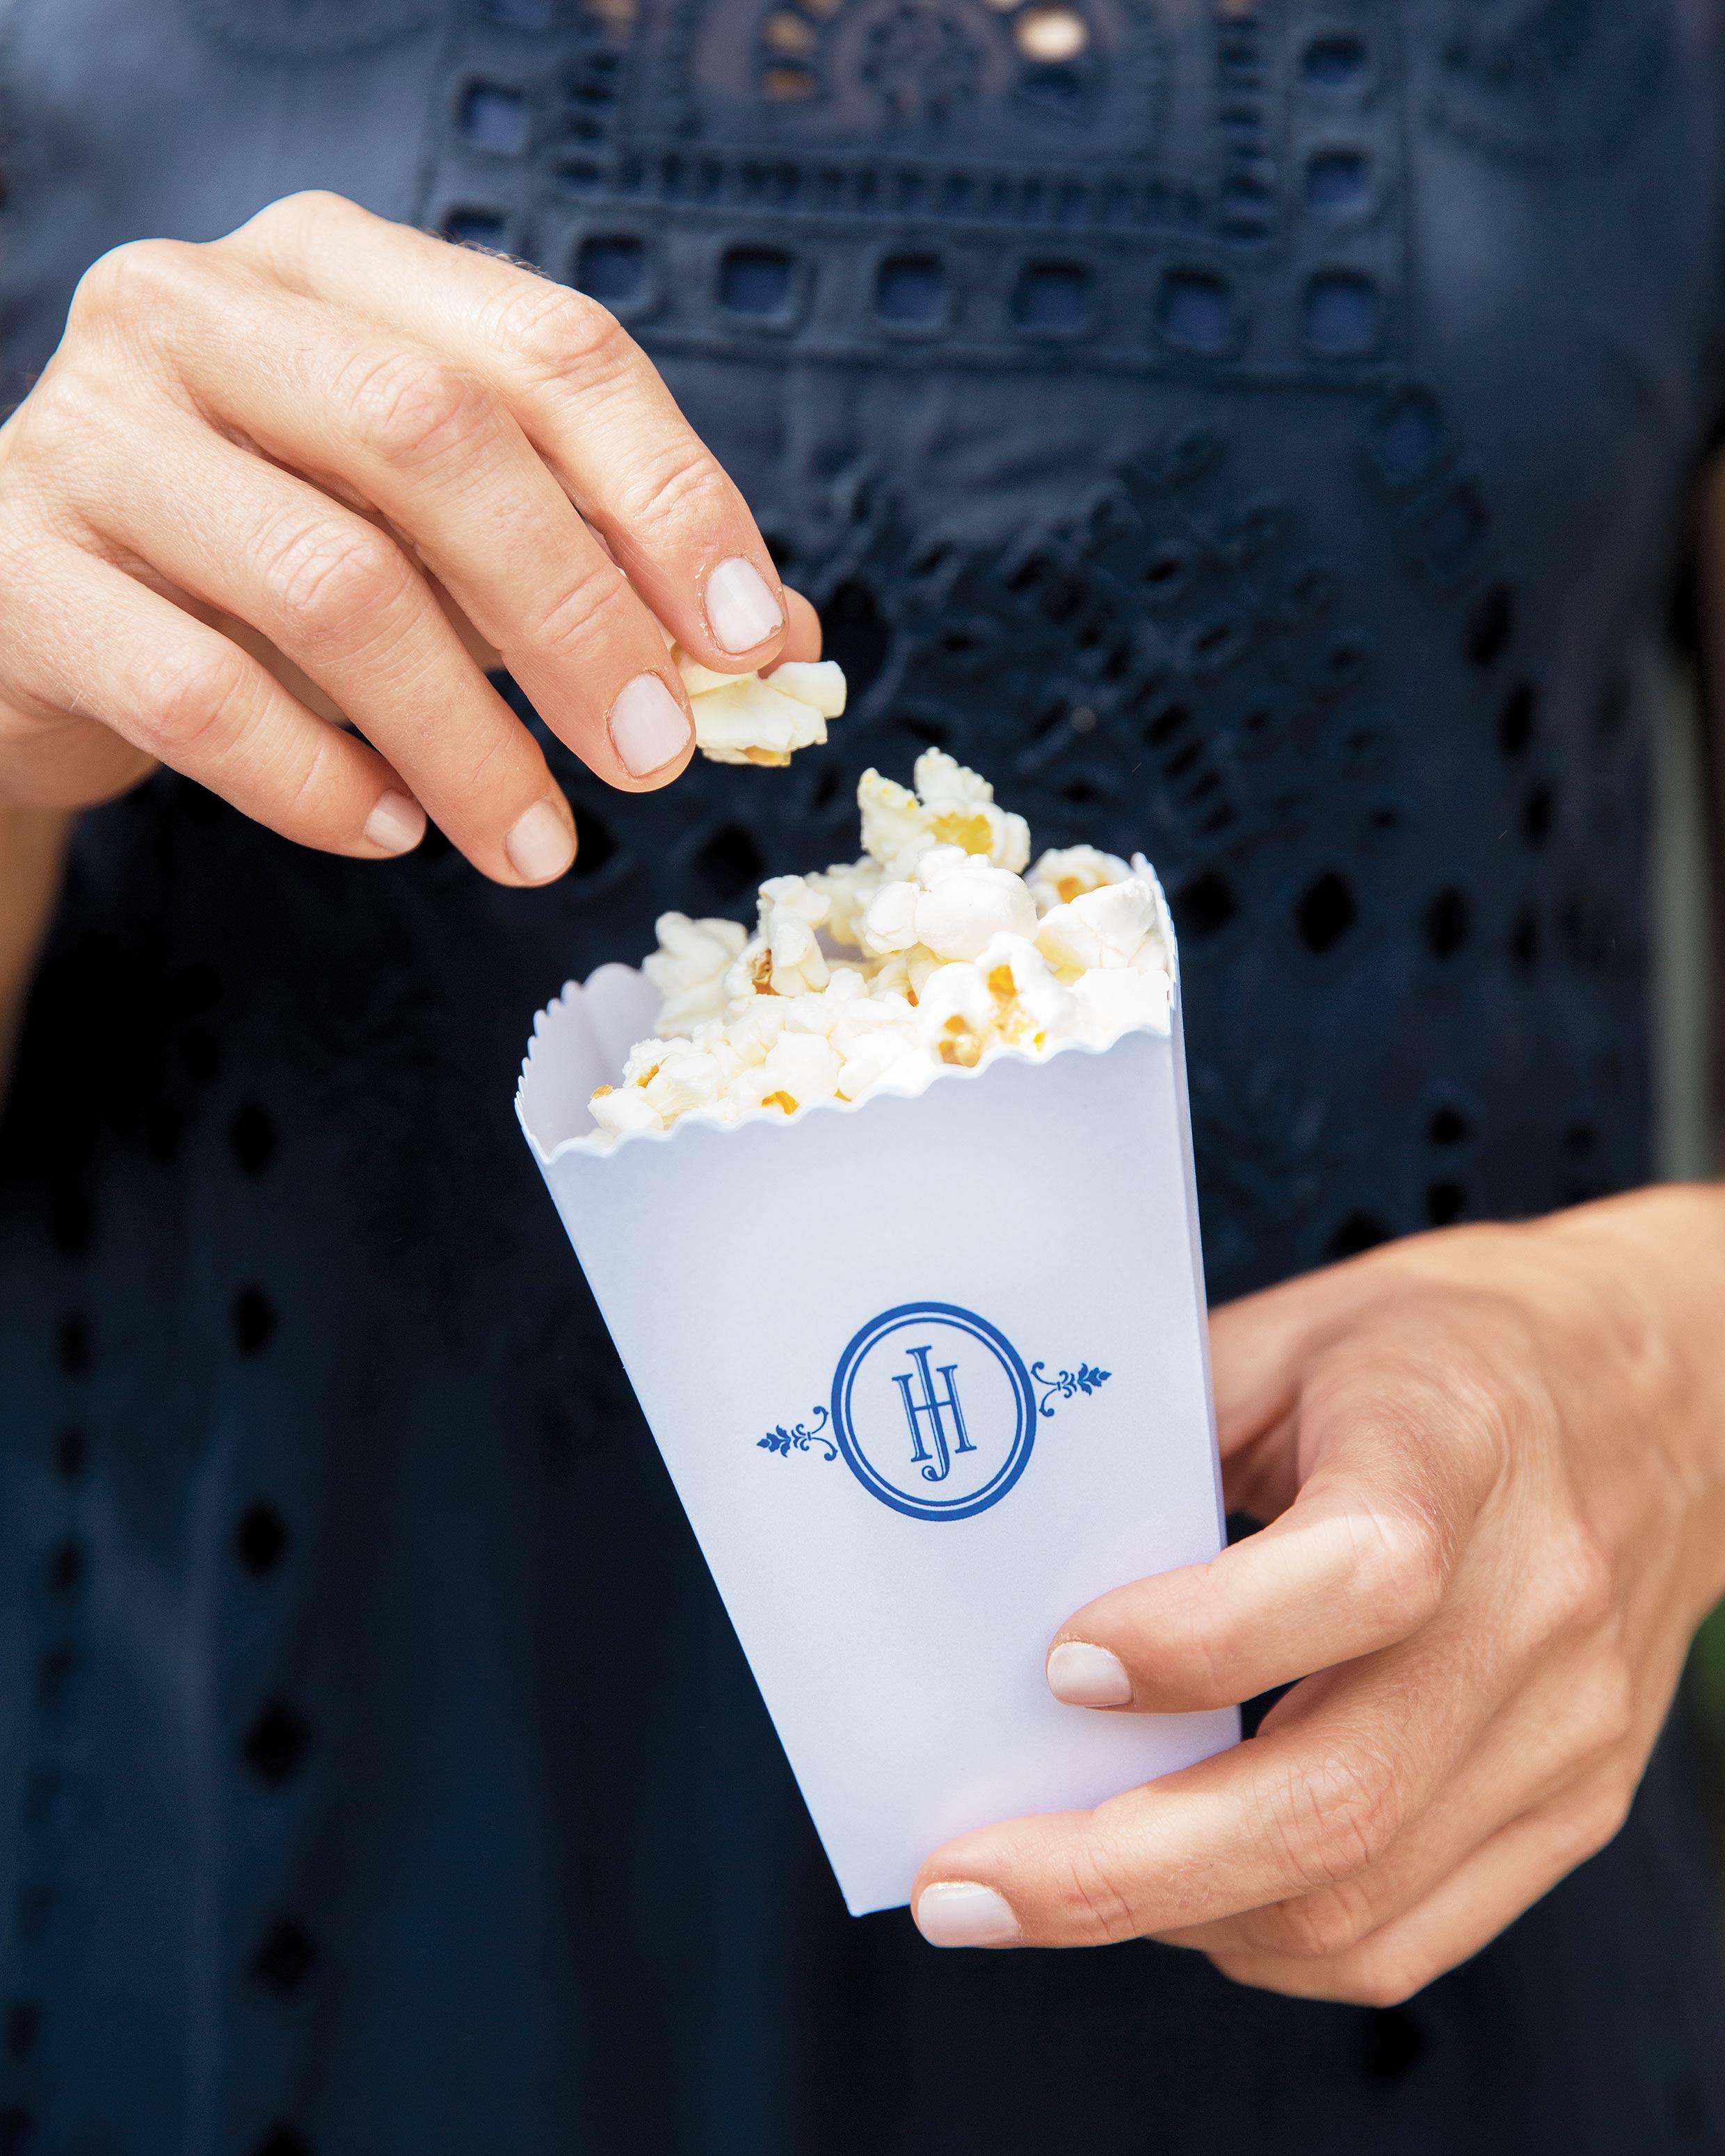 mhonor-jay-wedding-connecticut-popcorn-snacks-106-d112238.jpg